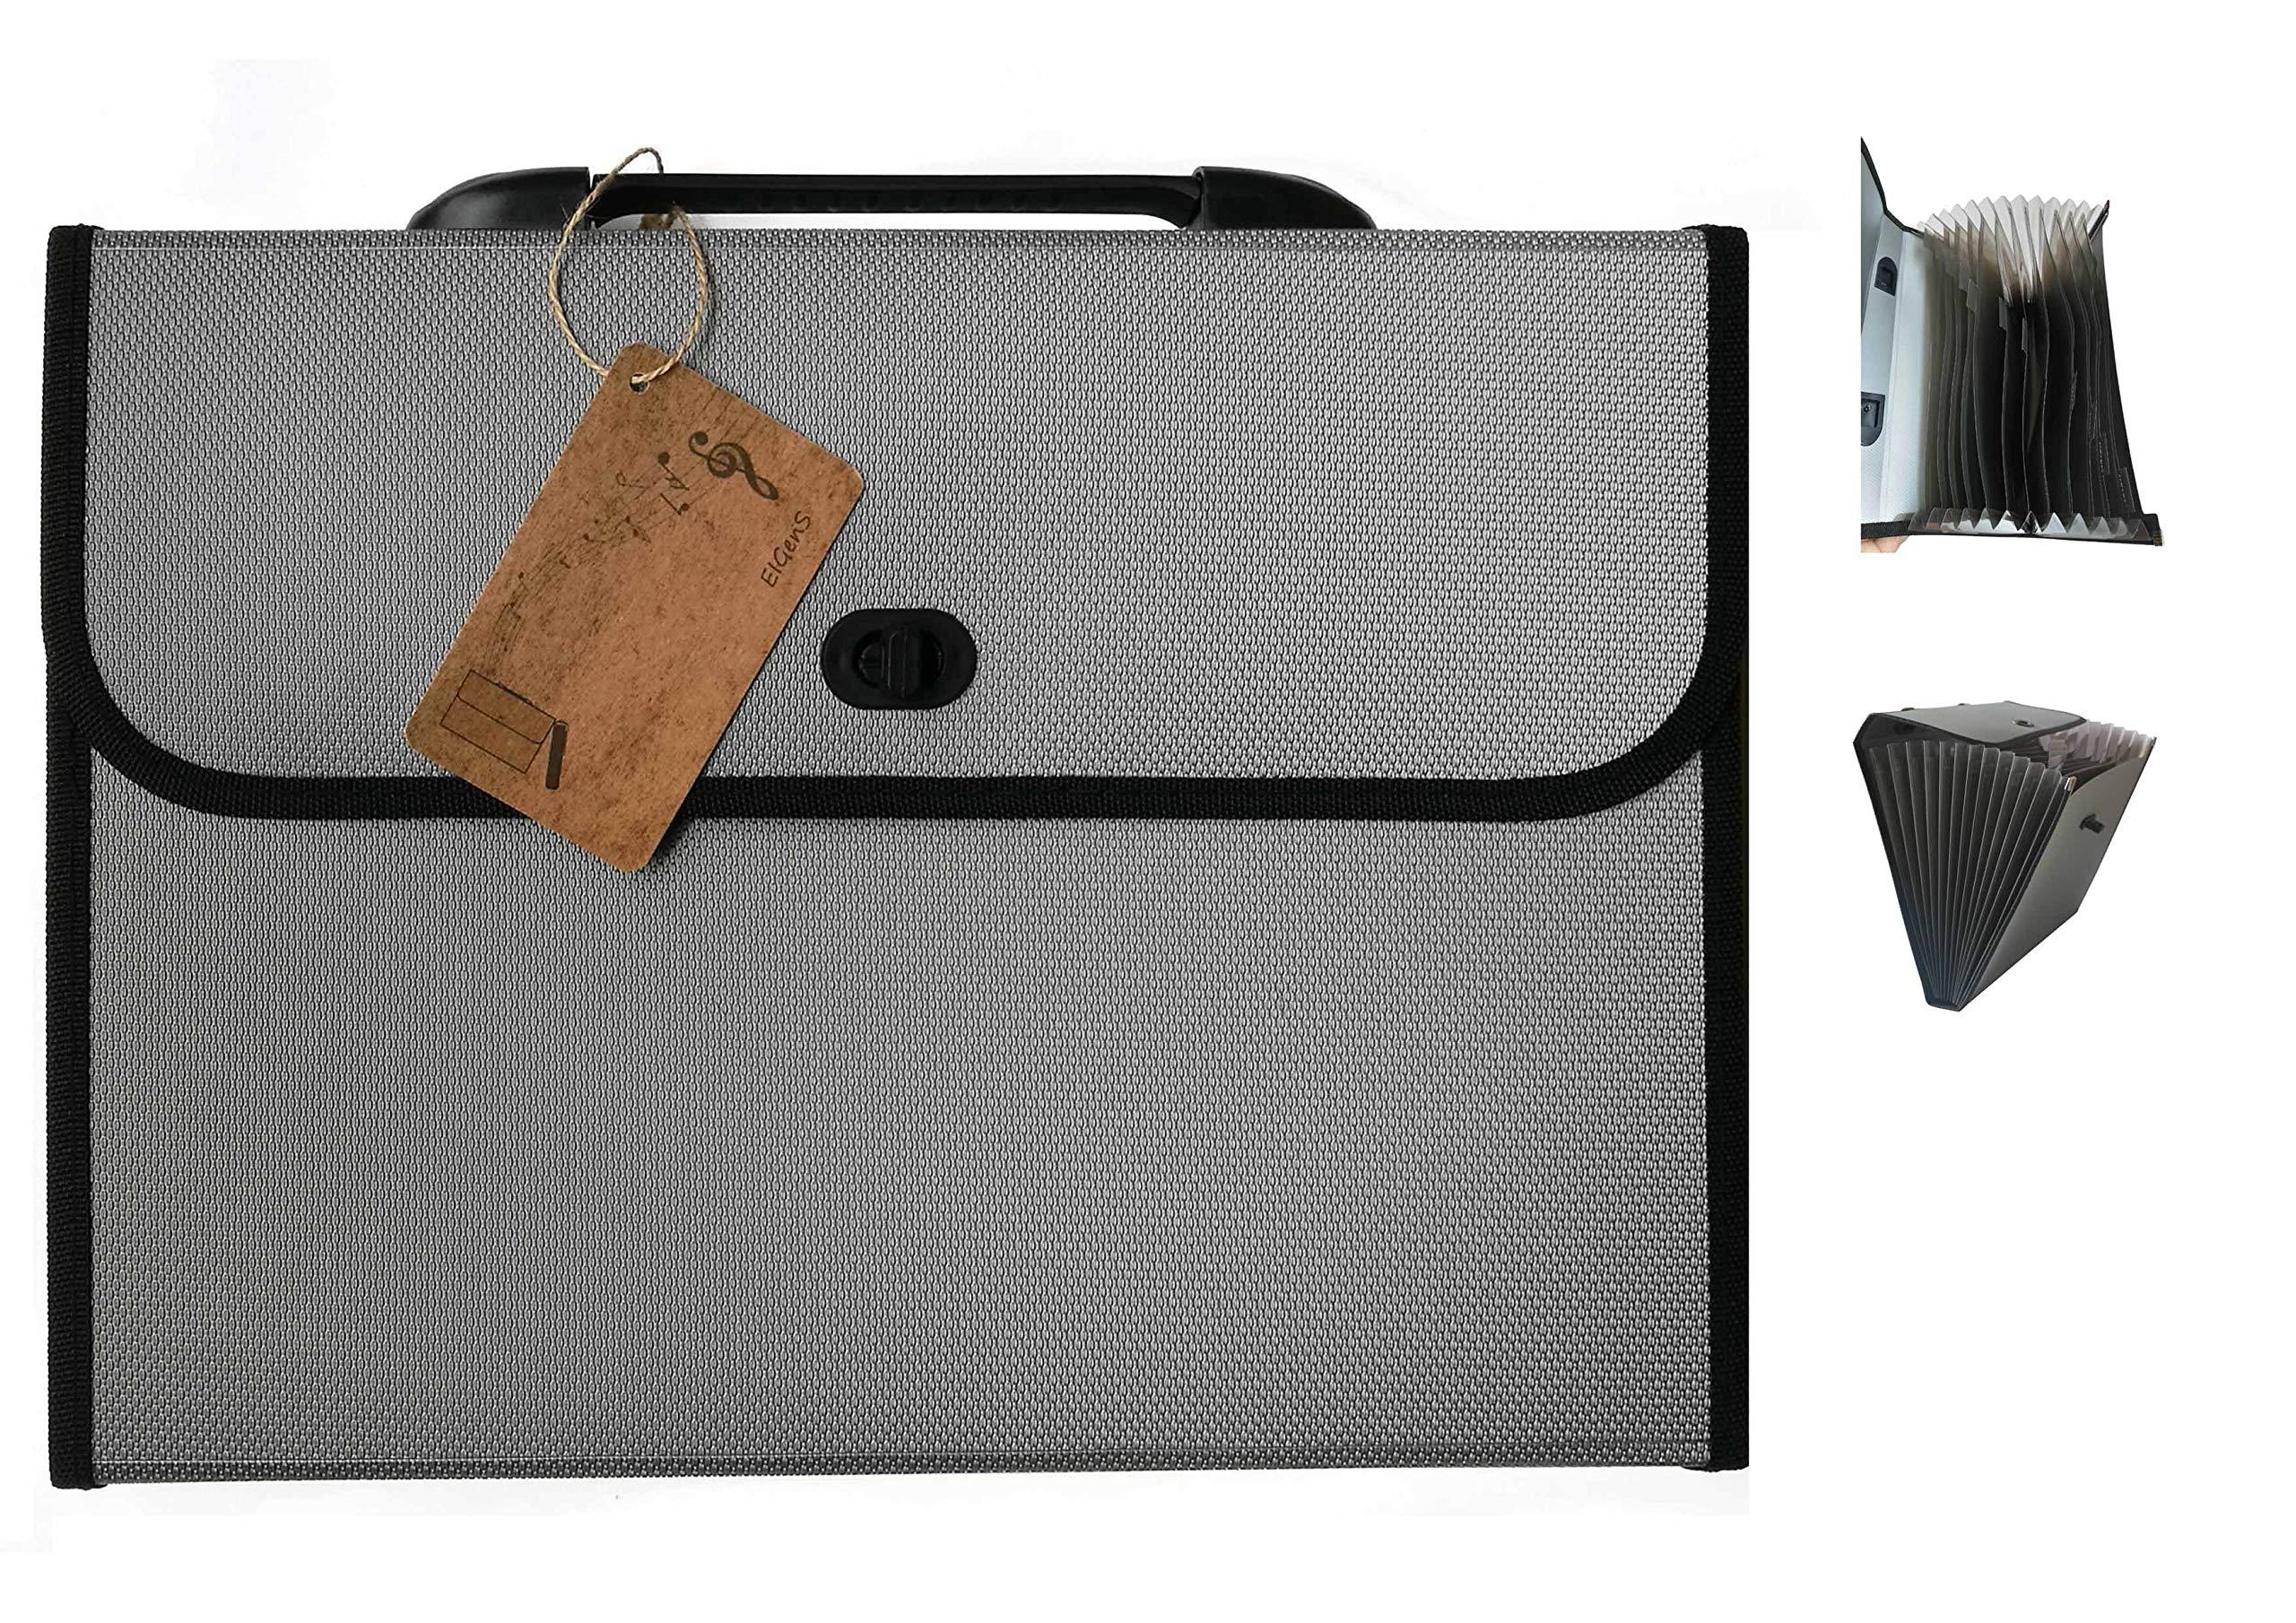 EIGenS 13 Pockets Expanding File Folder with Handle - A4 Size Expandable File Organizer File Folder Wallet Briefcase Documents Filing Box (Gray, Mediun)